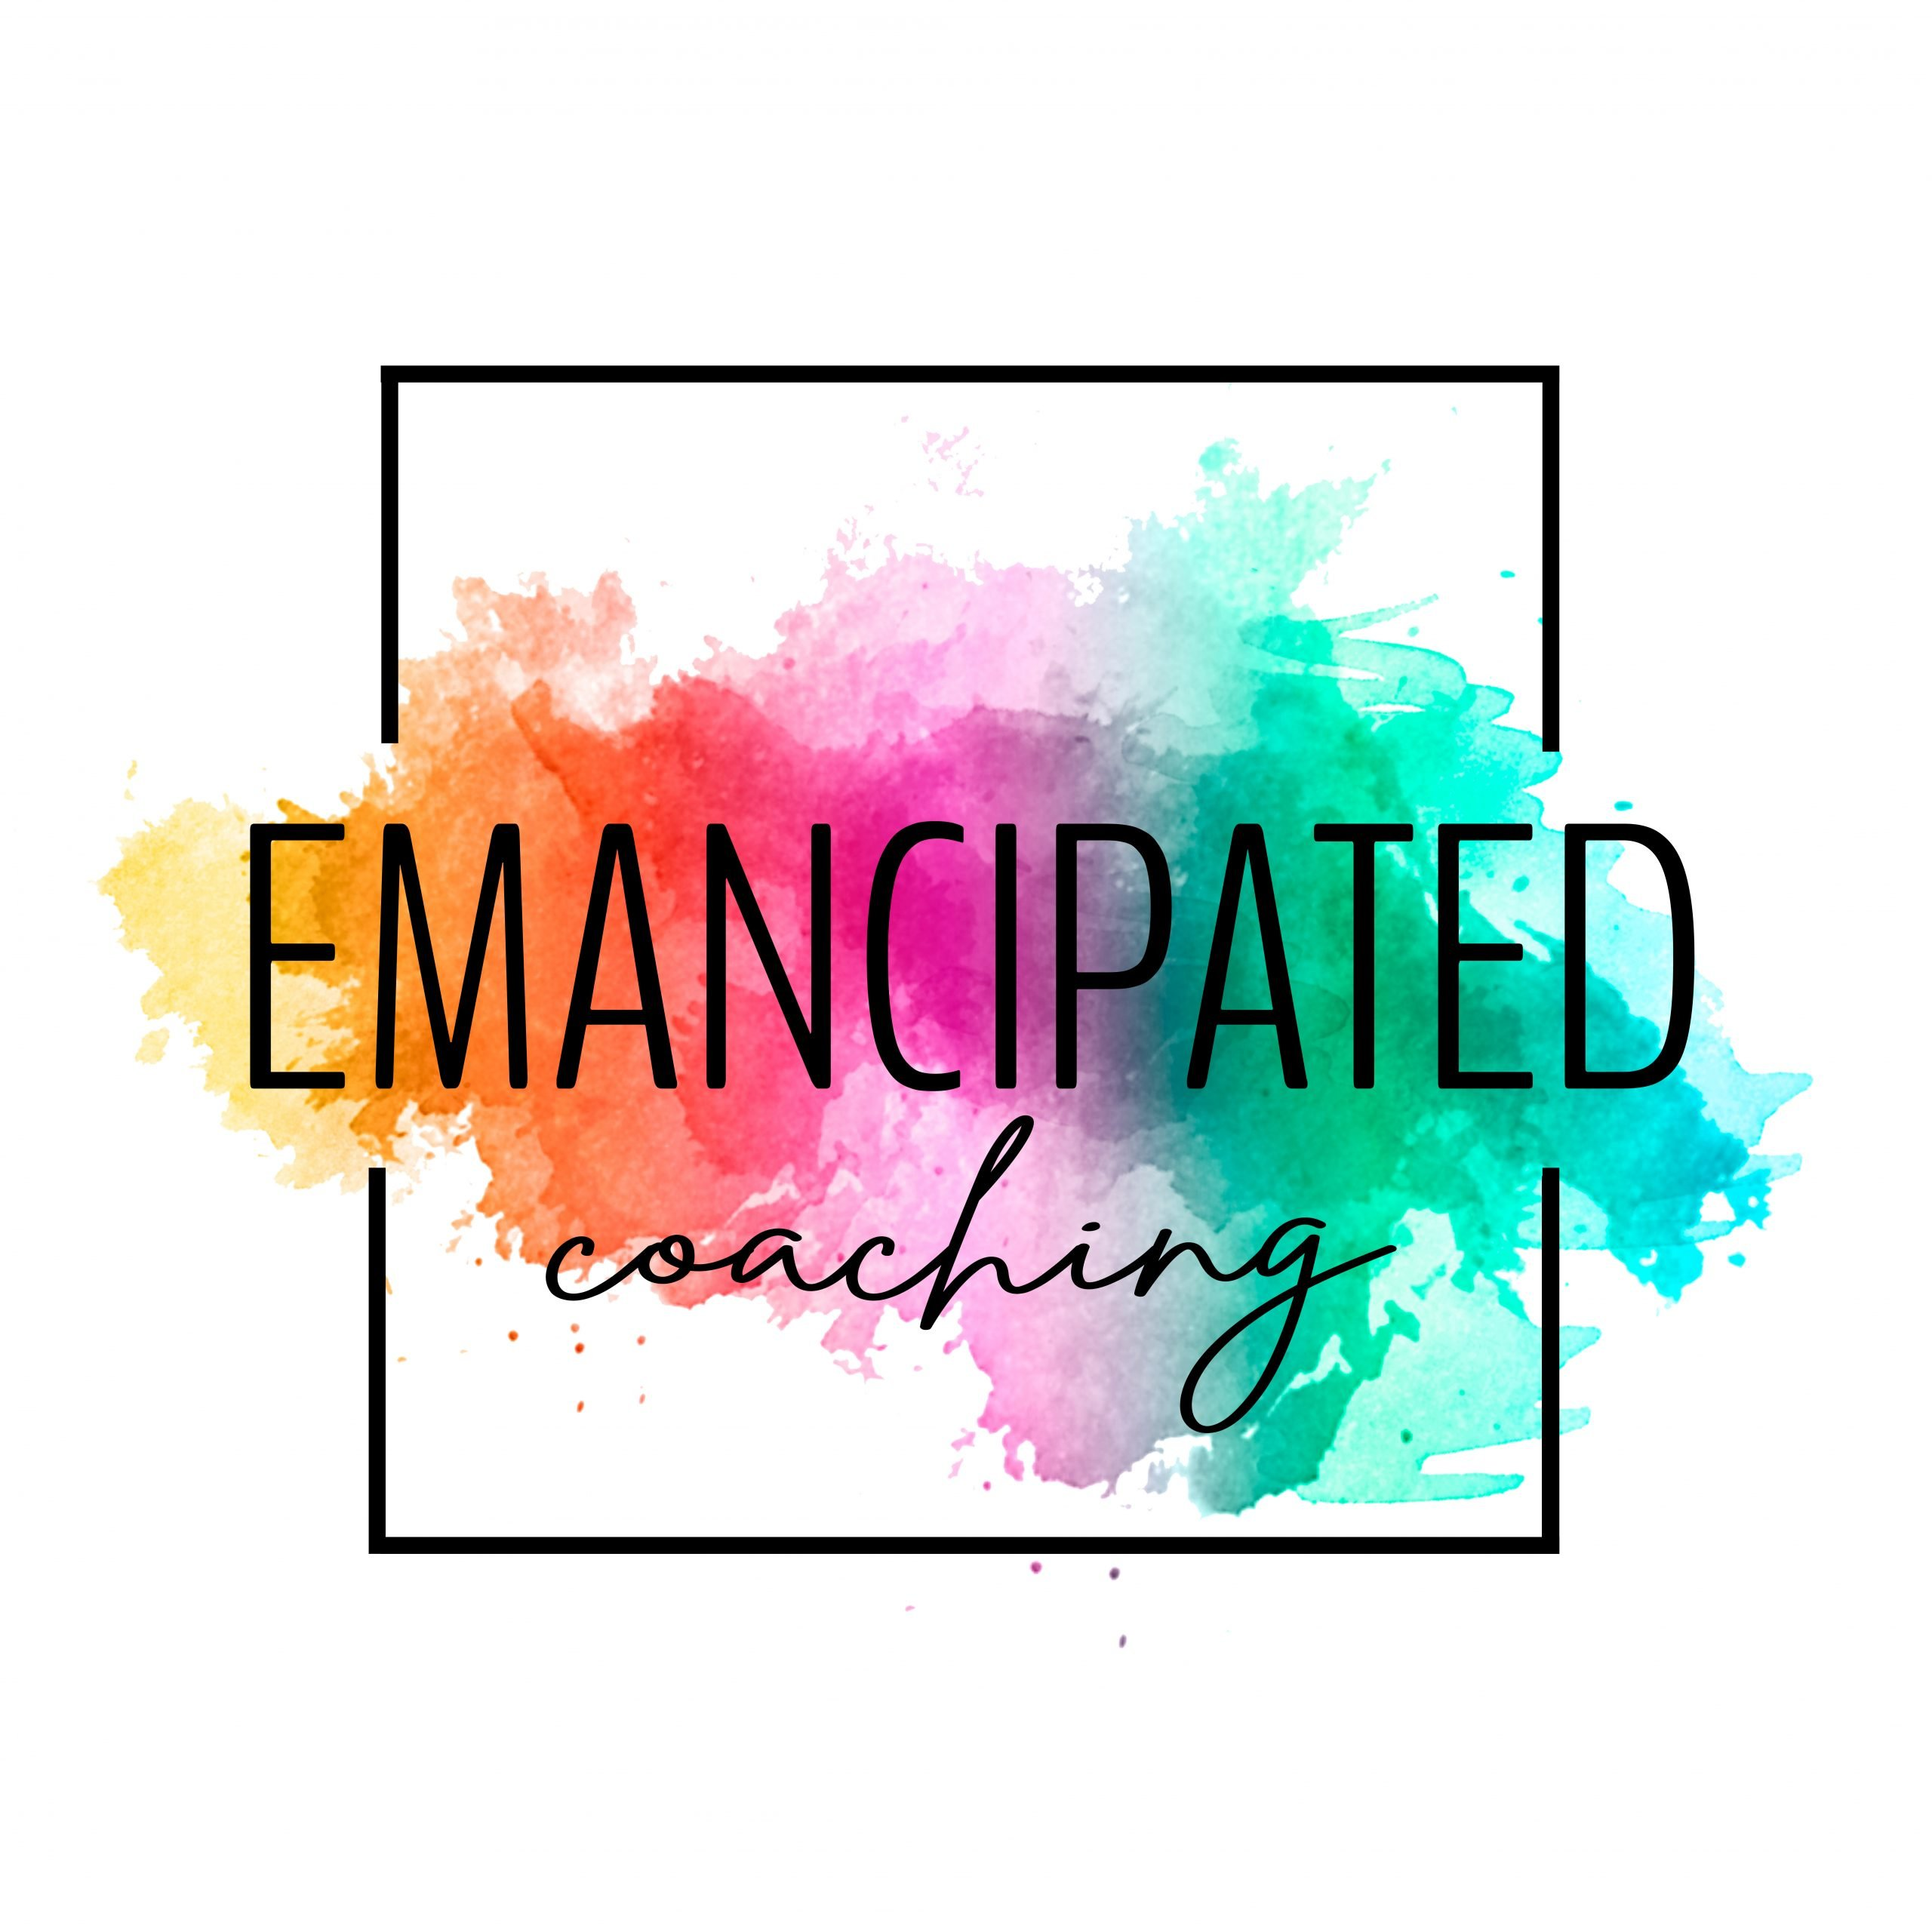 Emancipated Coaching